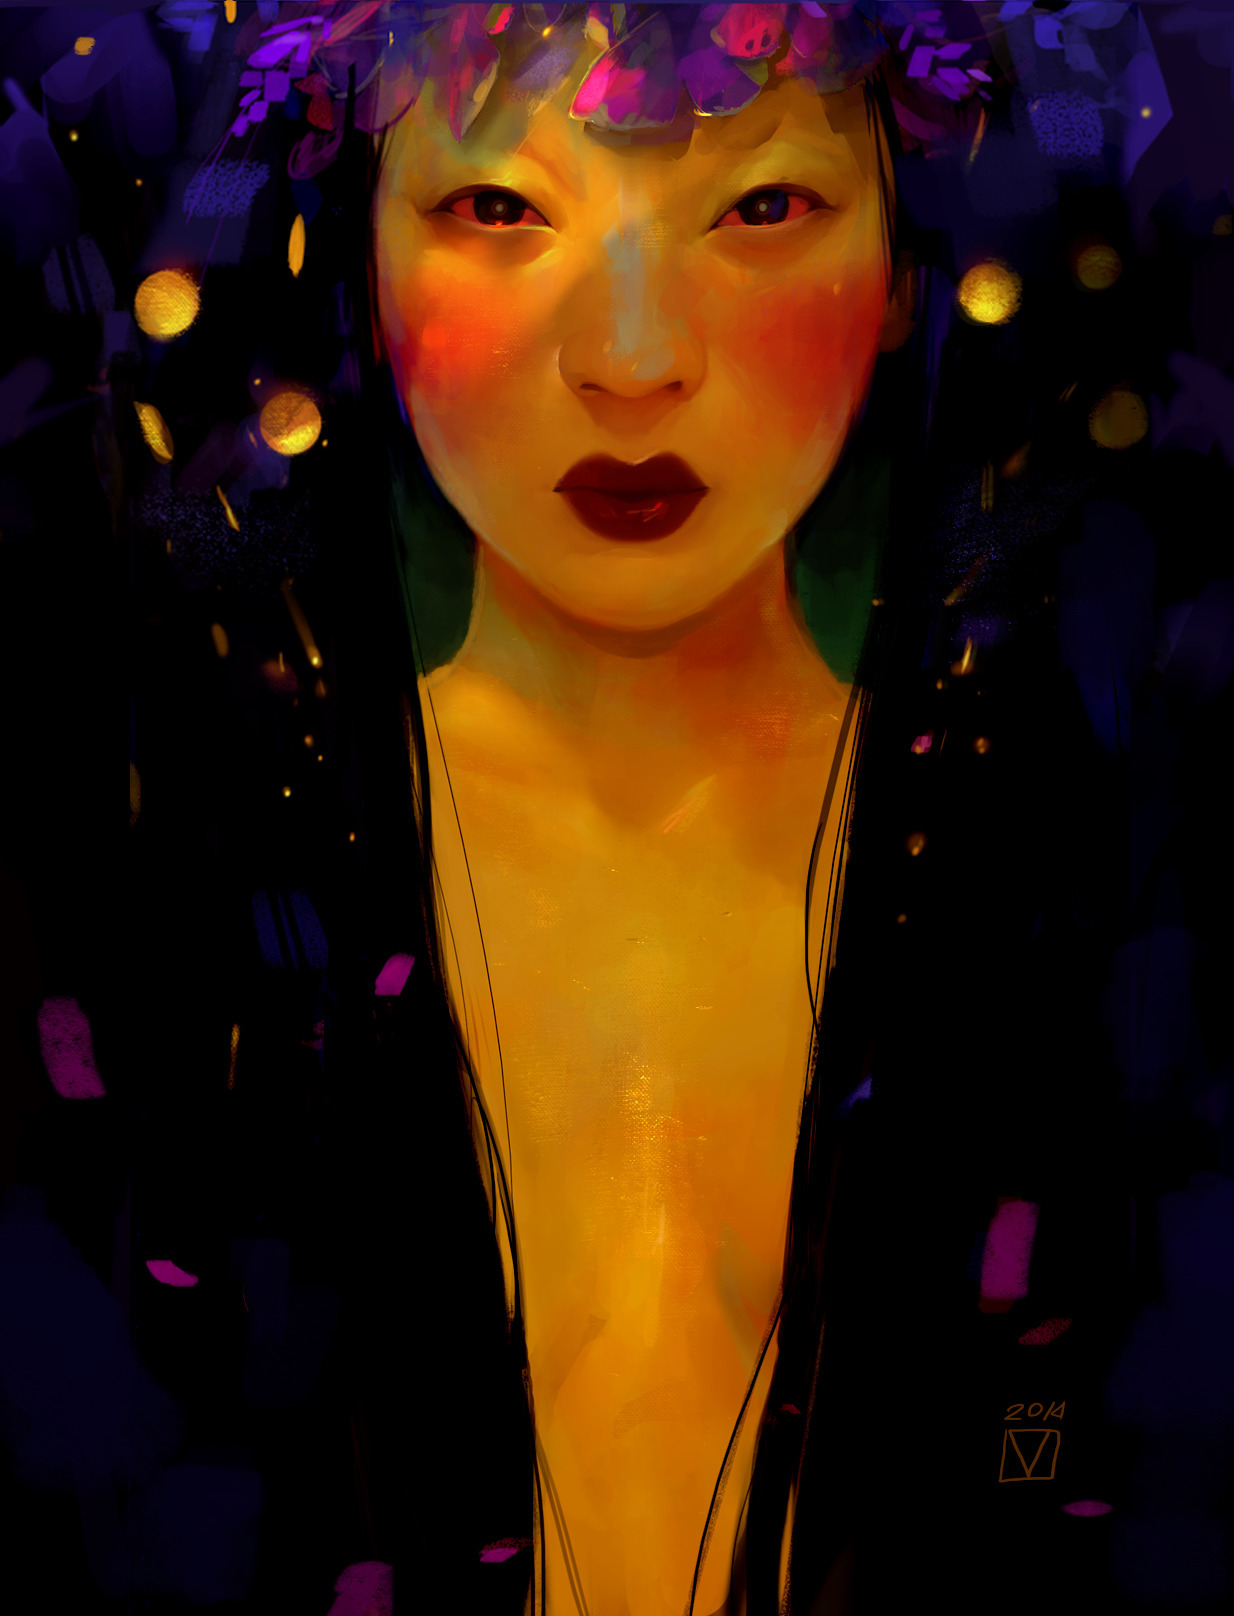 015 Summer Night - asian, woman - blad_moran | ello